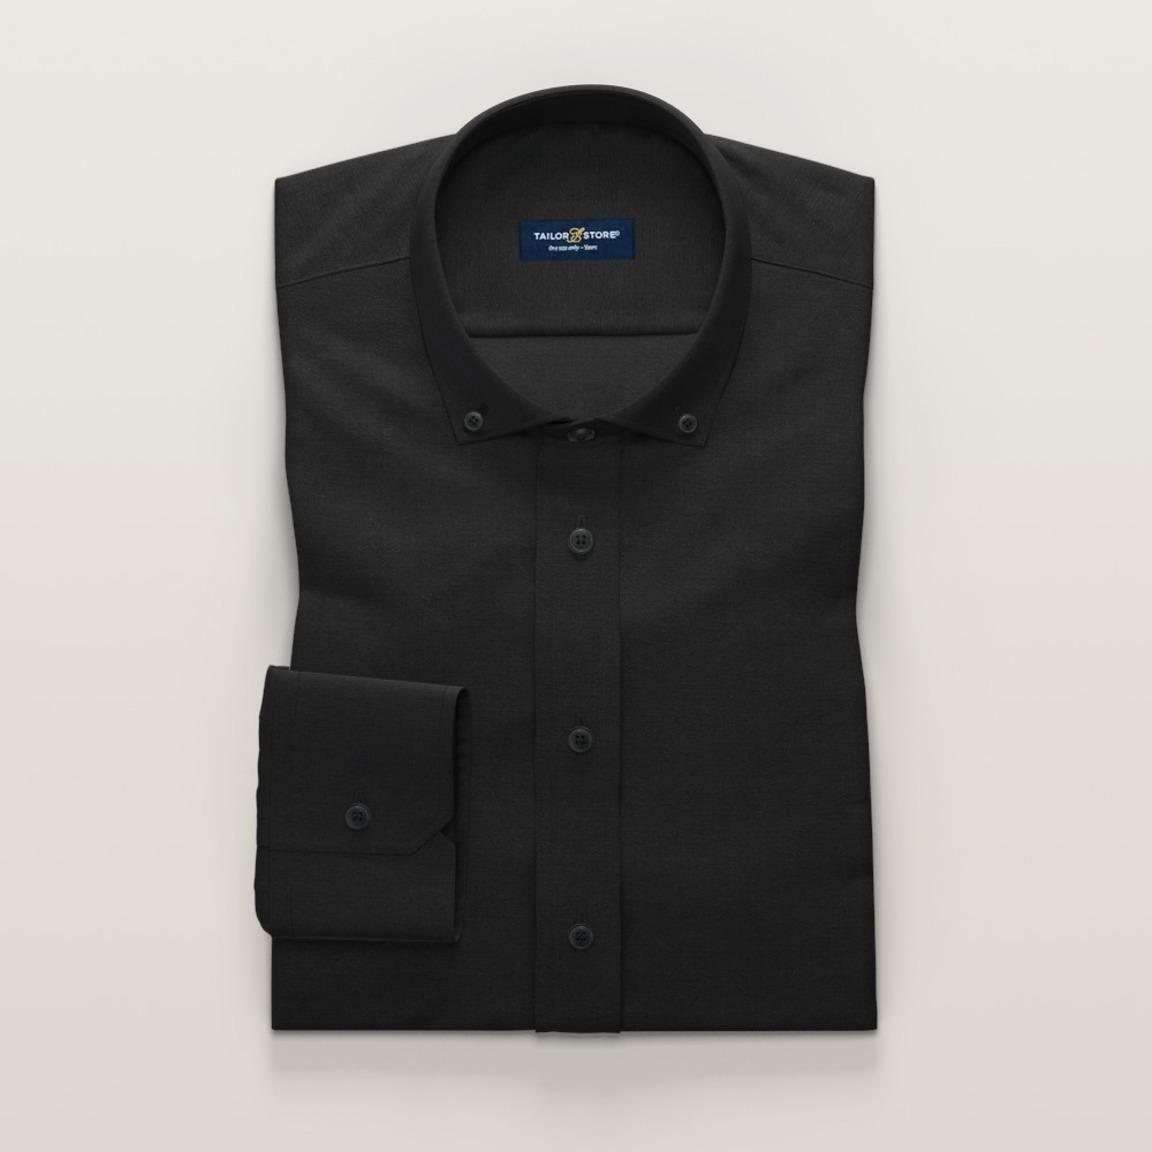 Damskjorta i svart linne